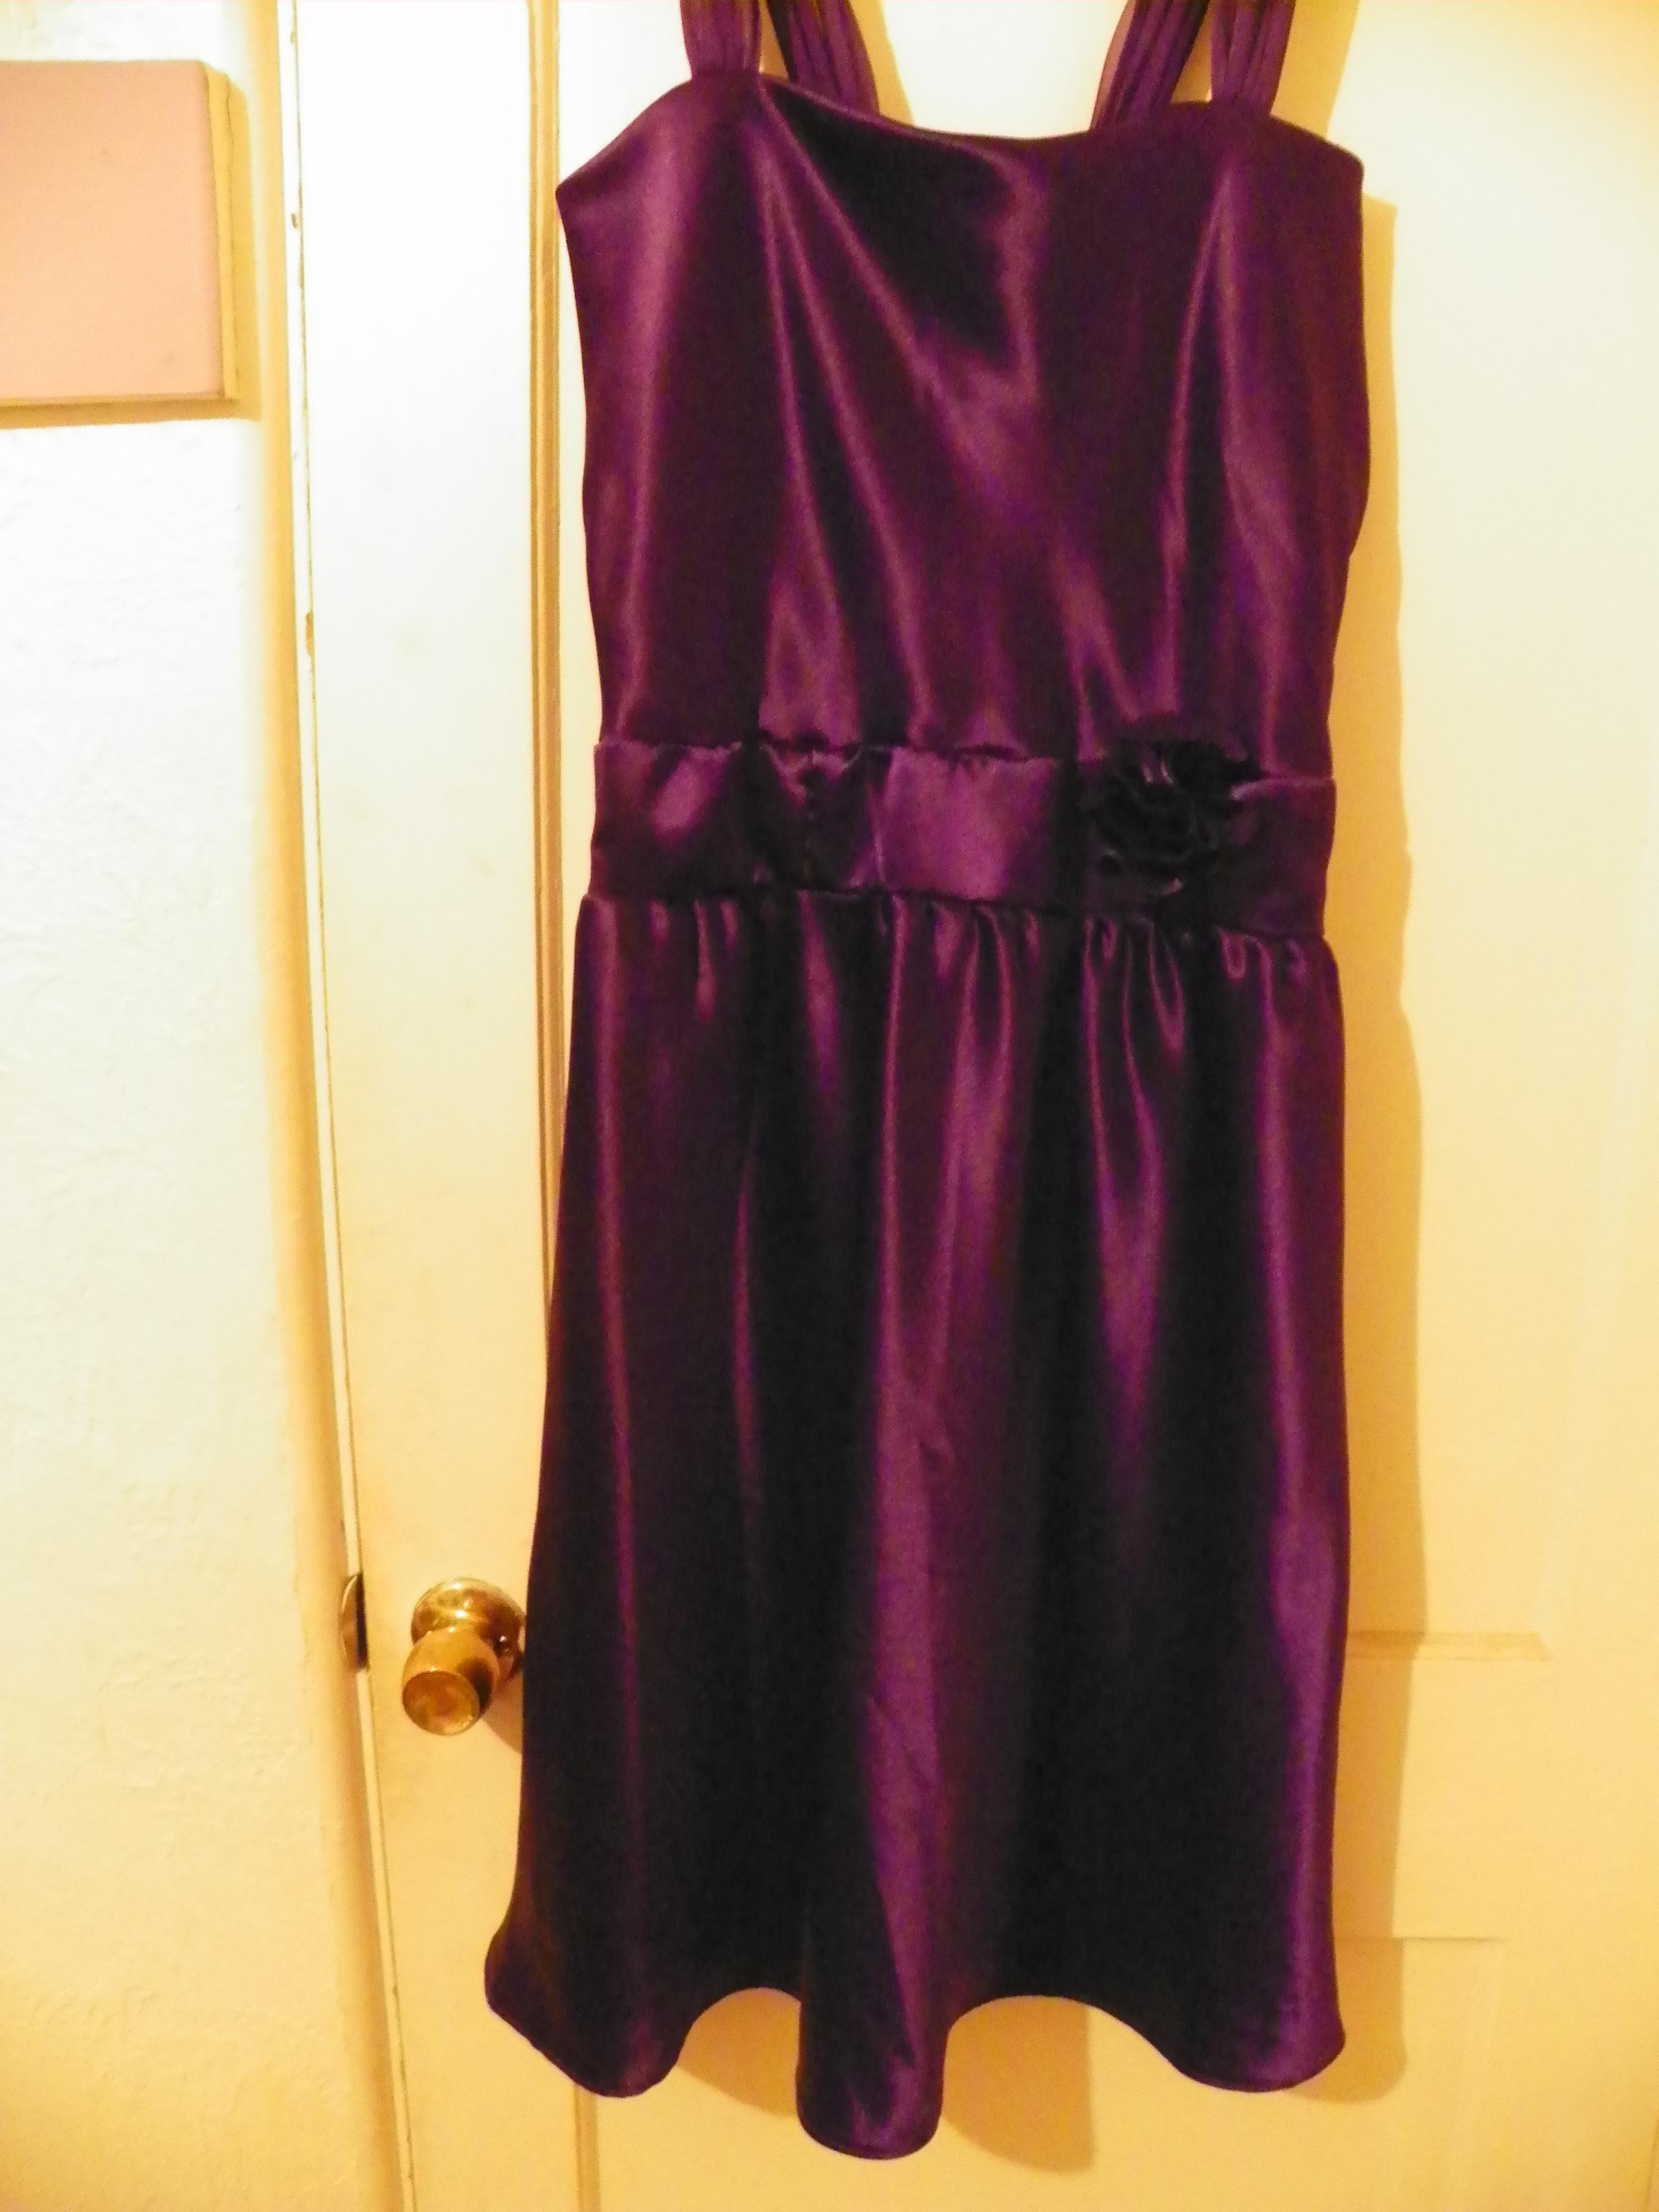 Thrift shop dress makeover